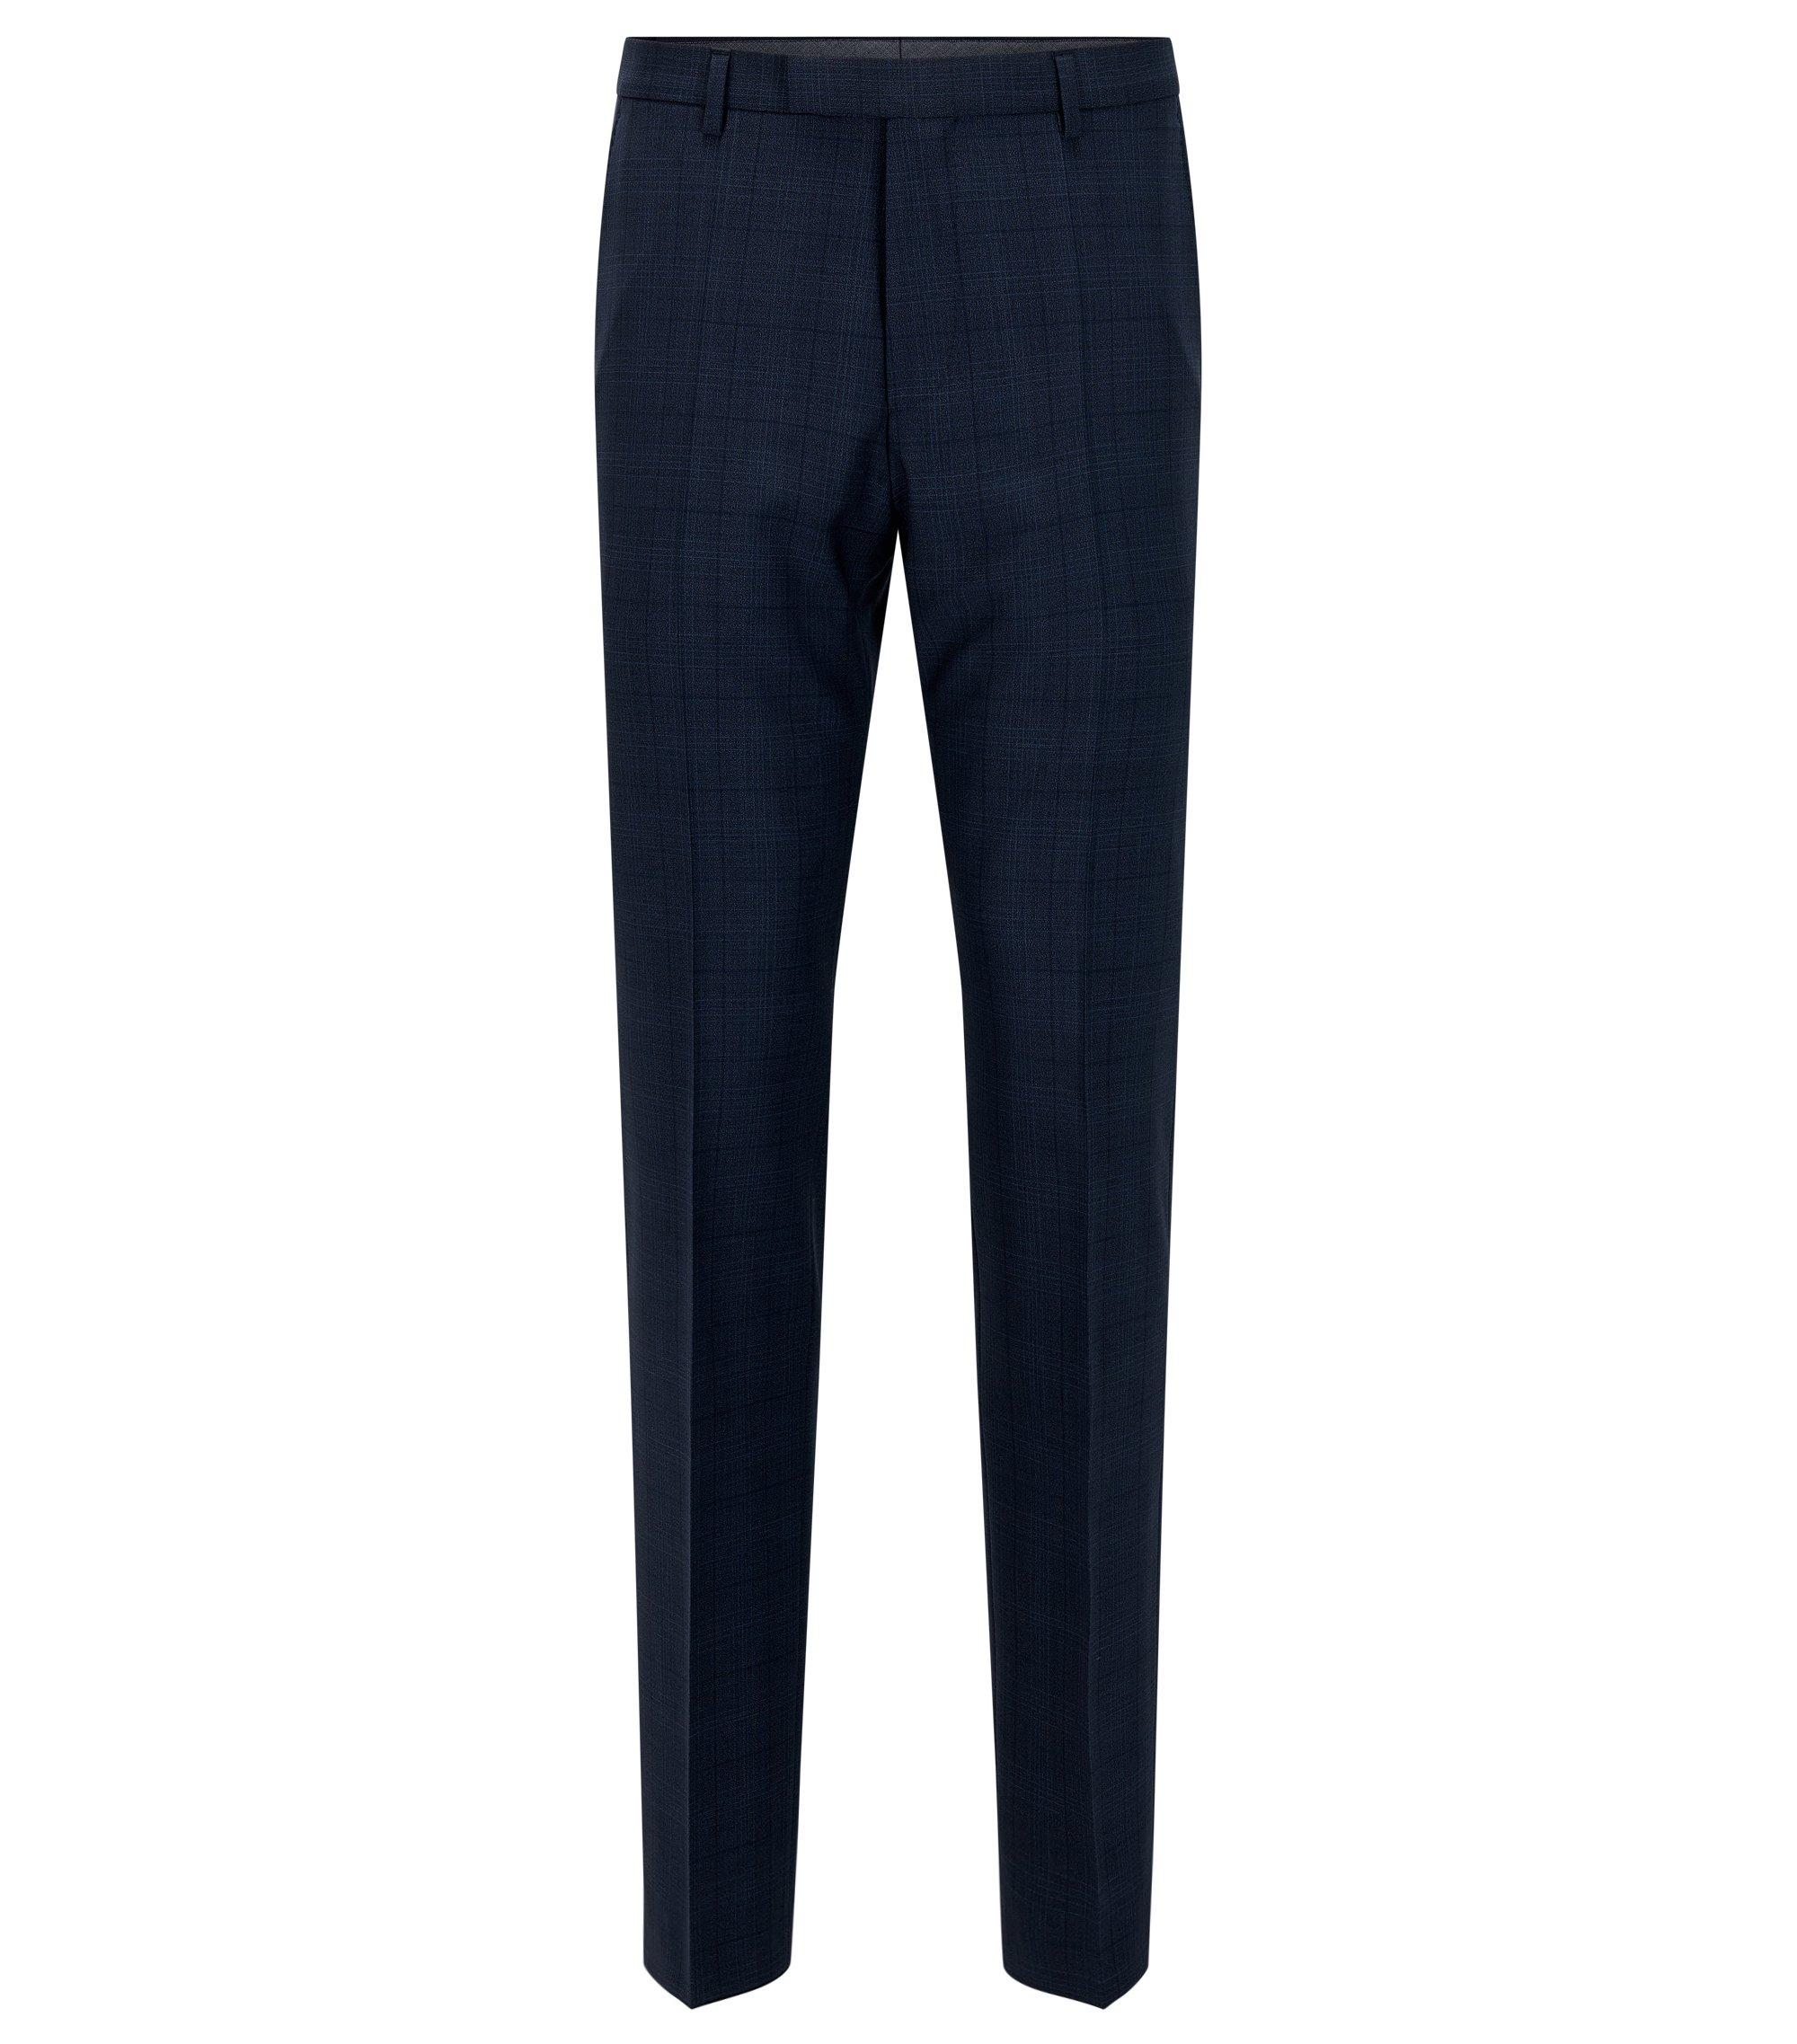 Pantaloni regular fit in lana vergine, Blu scuro